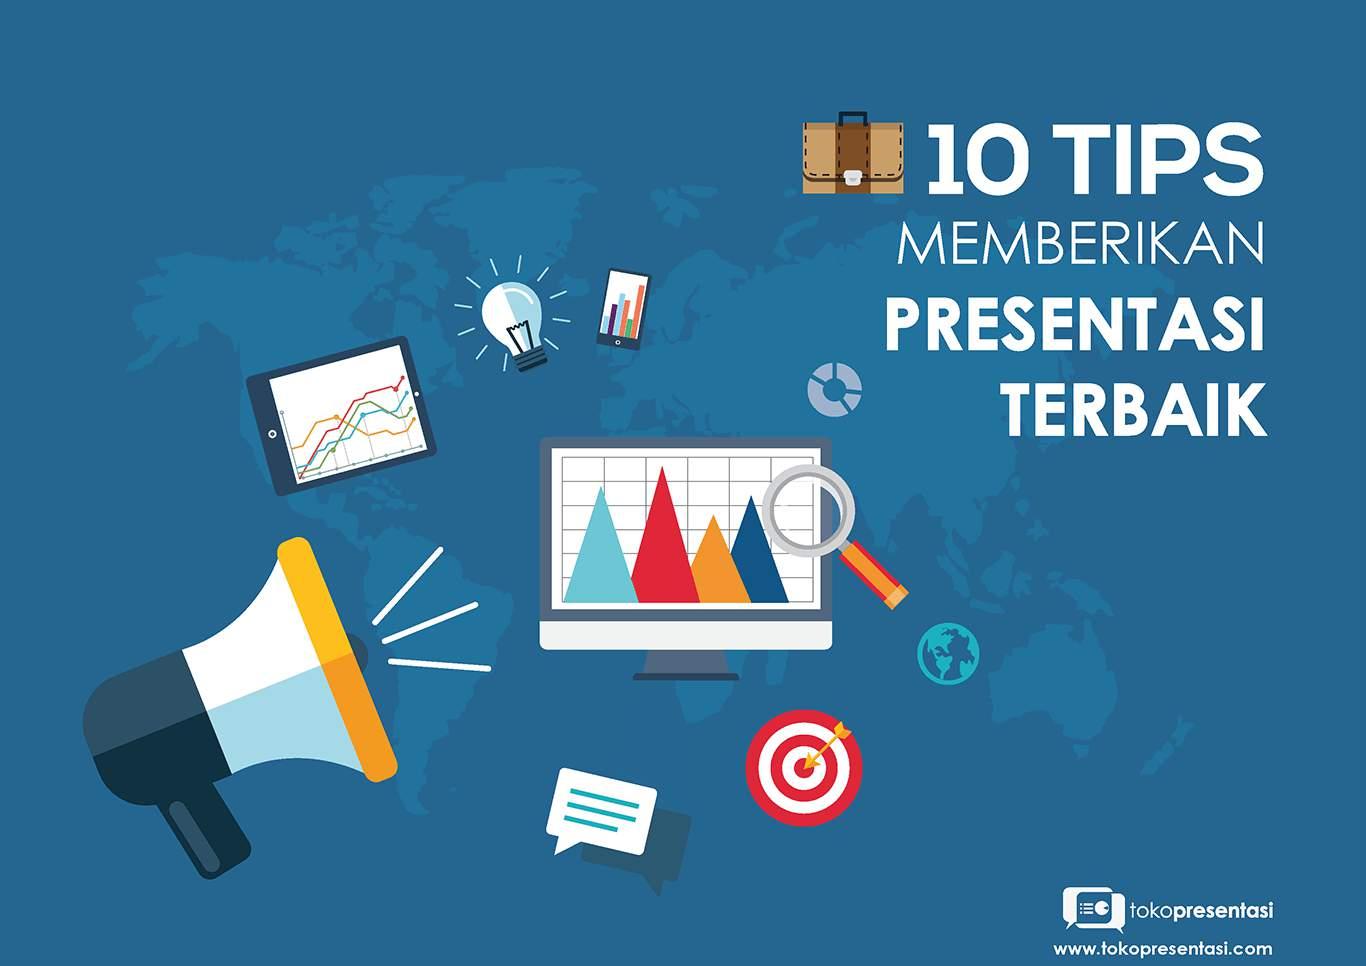 Toko Presentasi - 10 Tips Presentasi Terbaik  Jasa